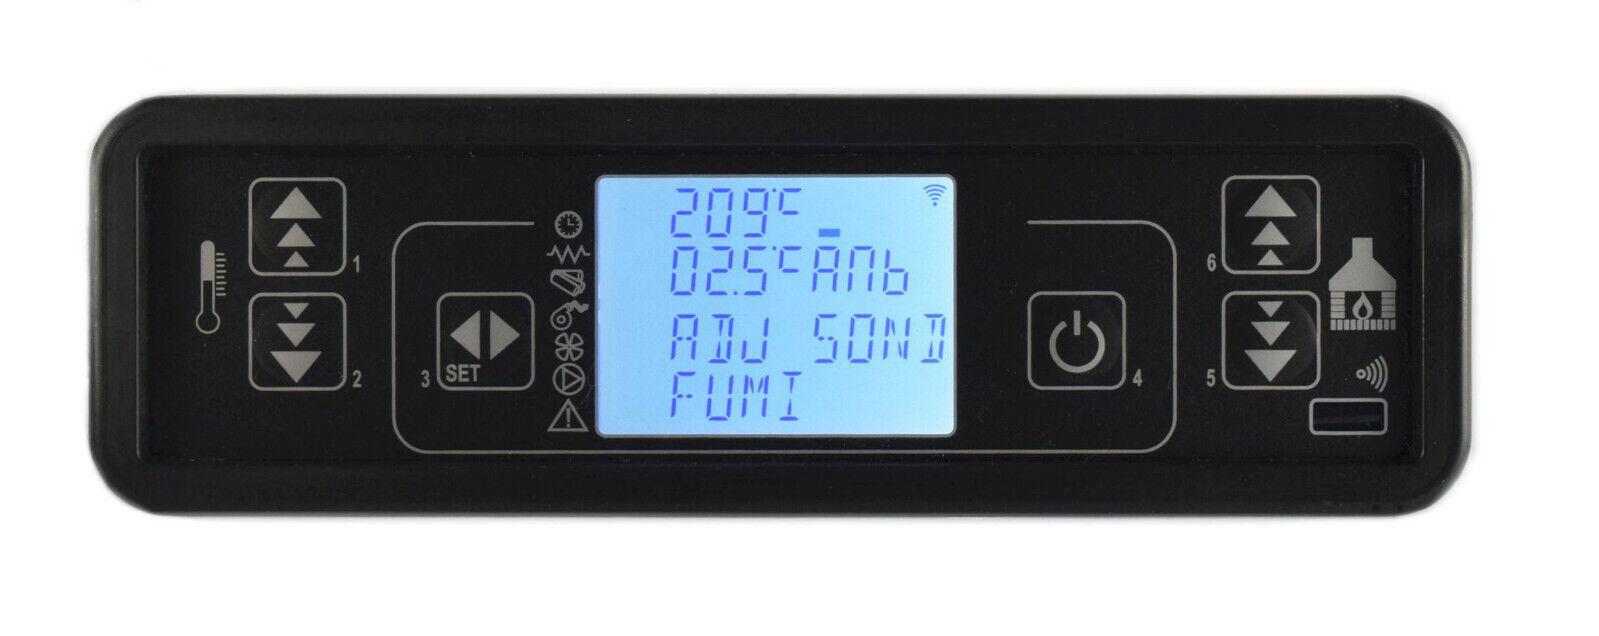 DISPLAY TECLADO LCD F047_2 MICRONOVA PARA ESTUFAS DE PELLETS